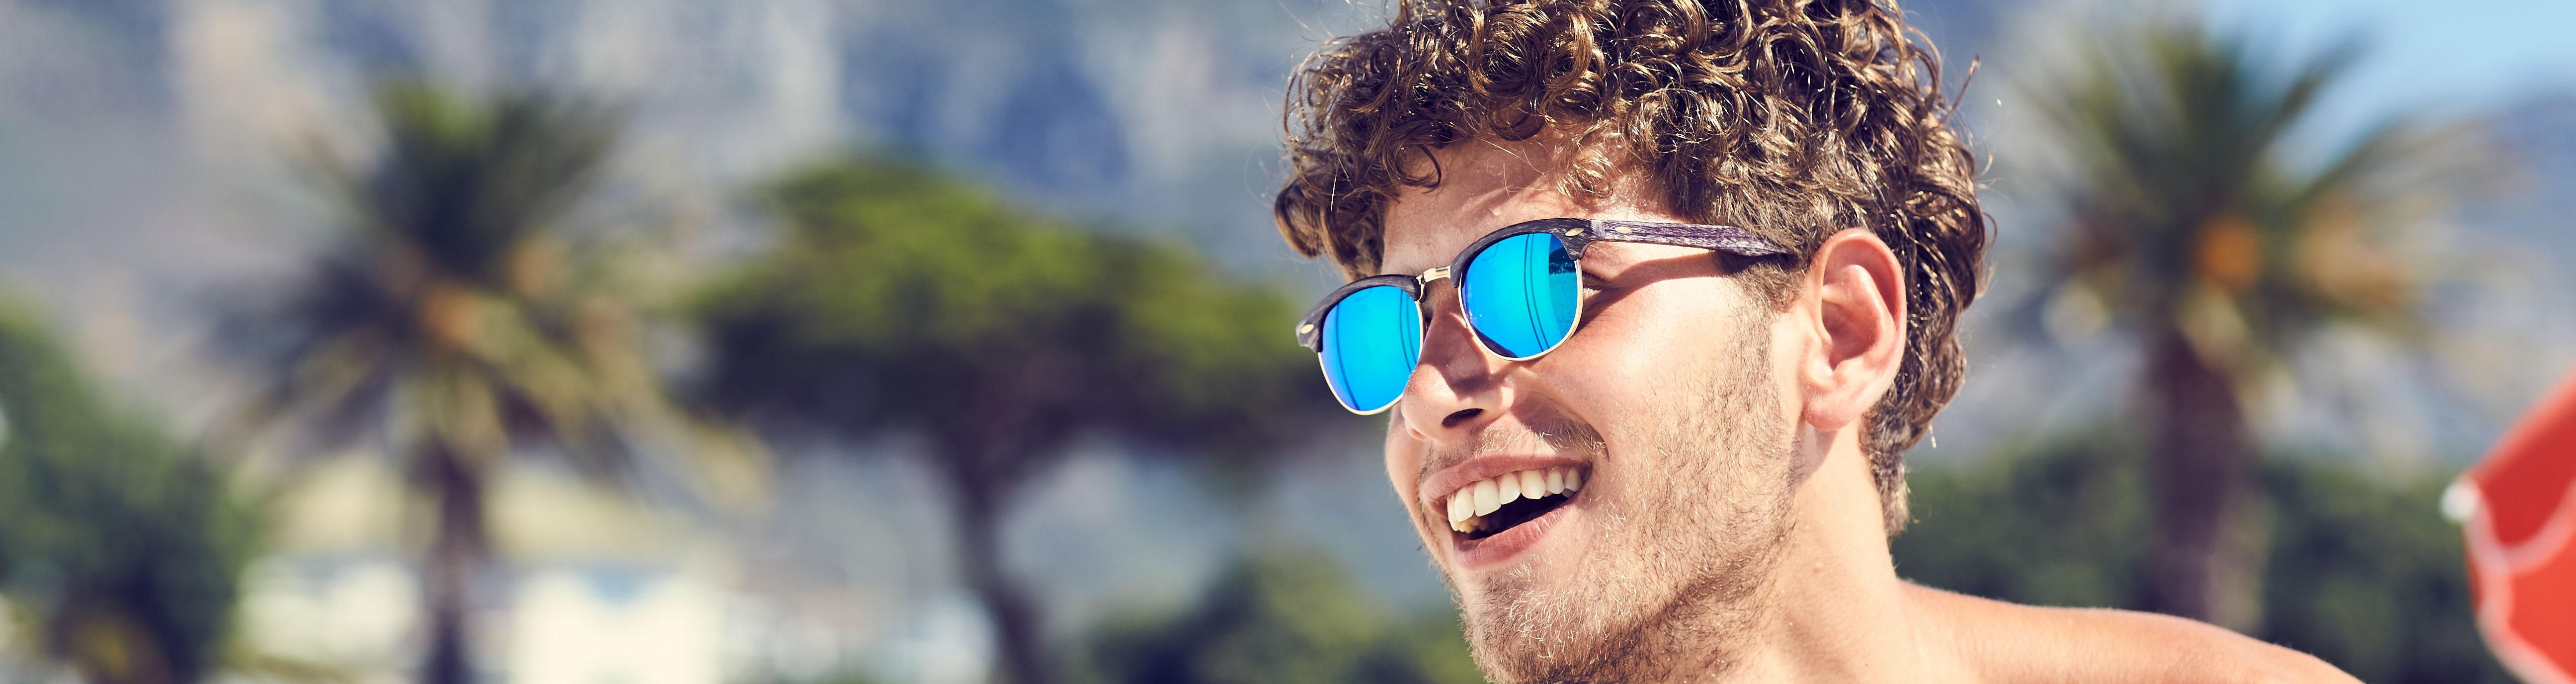 Woodlook Sunglasses